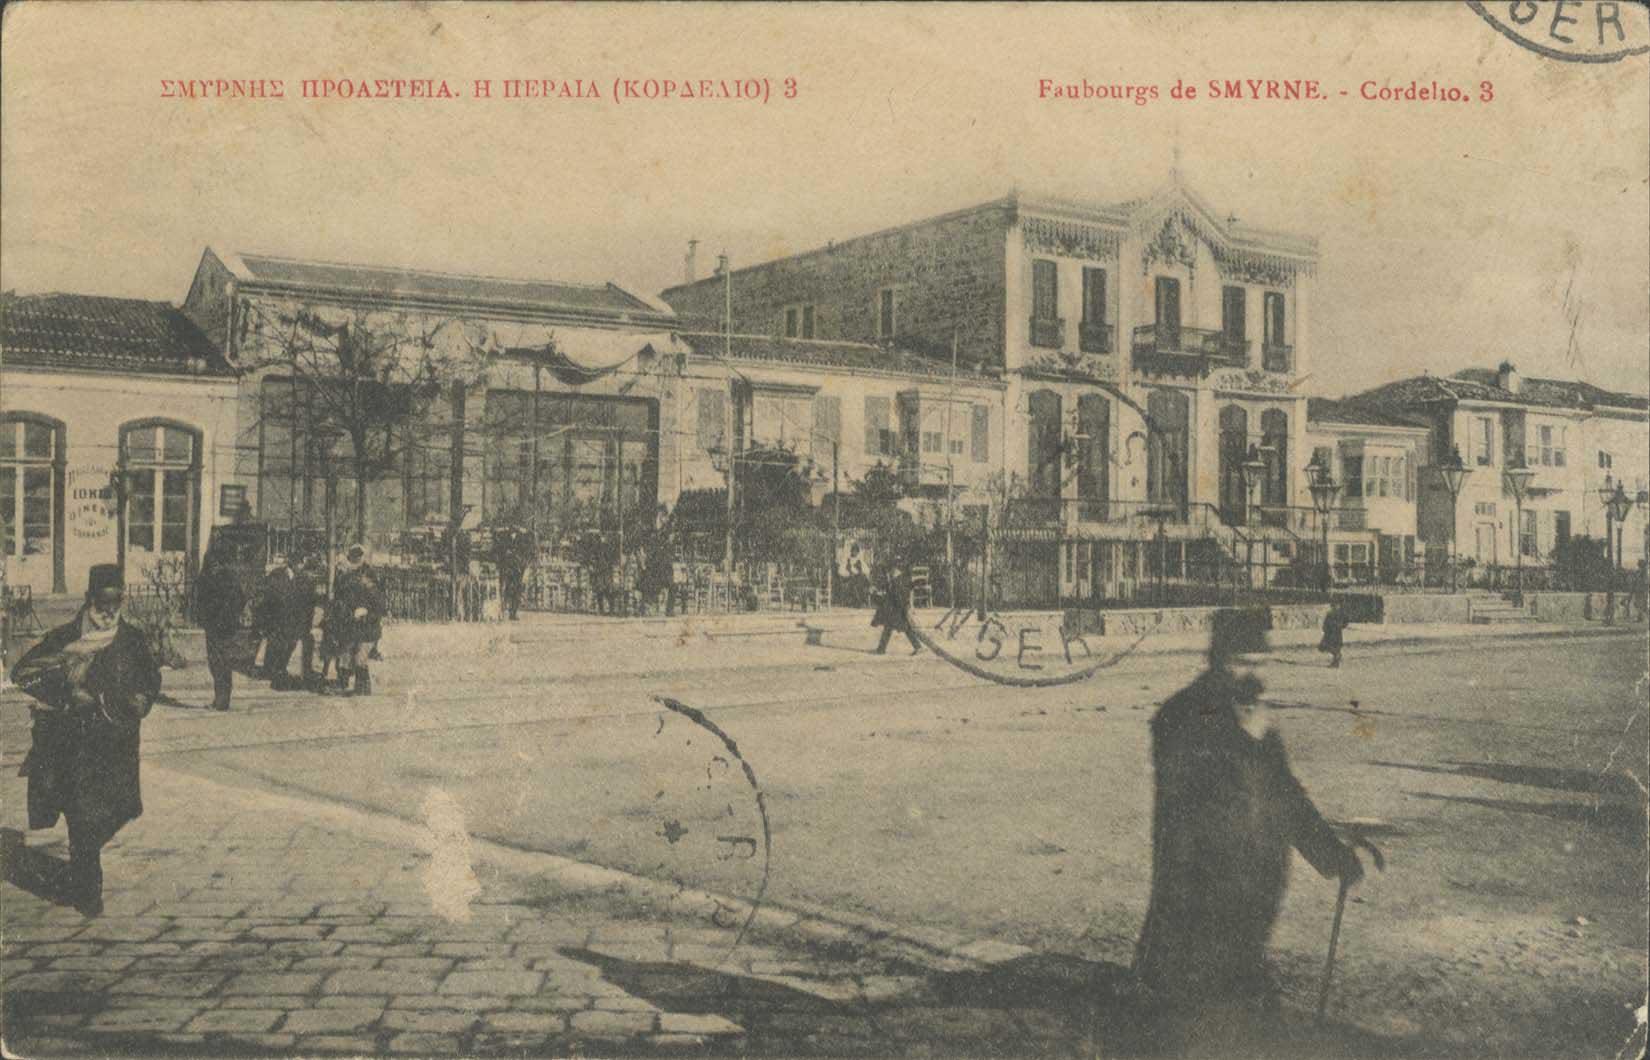 Lot 1597 - -  PICTURE POSTCARDS SMYRNE, CONSTANTINOPLE, ASIA MINOR -  A. Karamitsos Public & Live Internet Auction 683